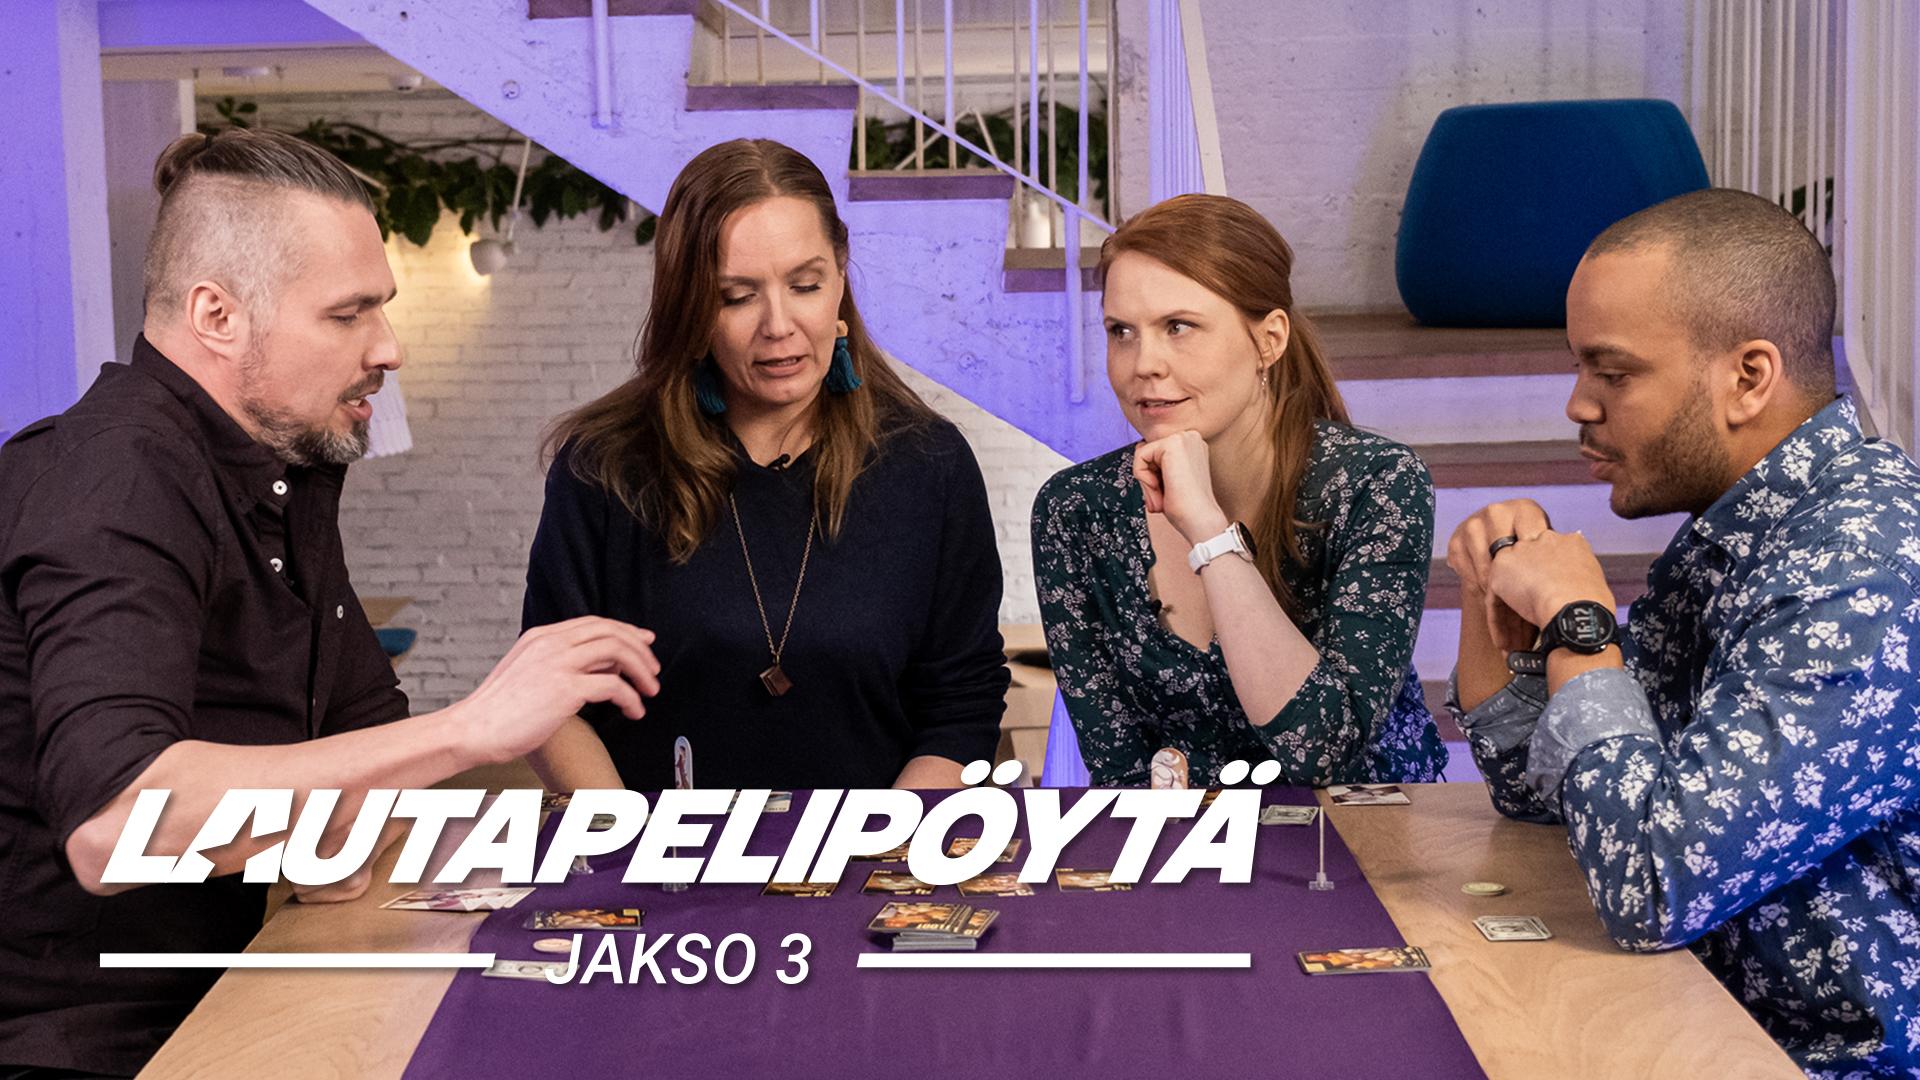 Lautapelipoyta Thumbnail jakso-3